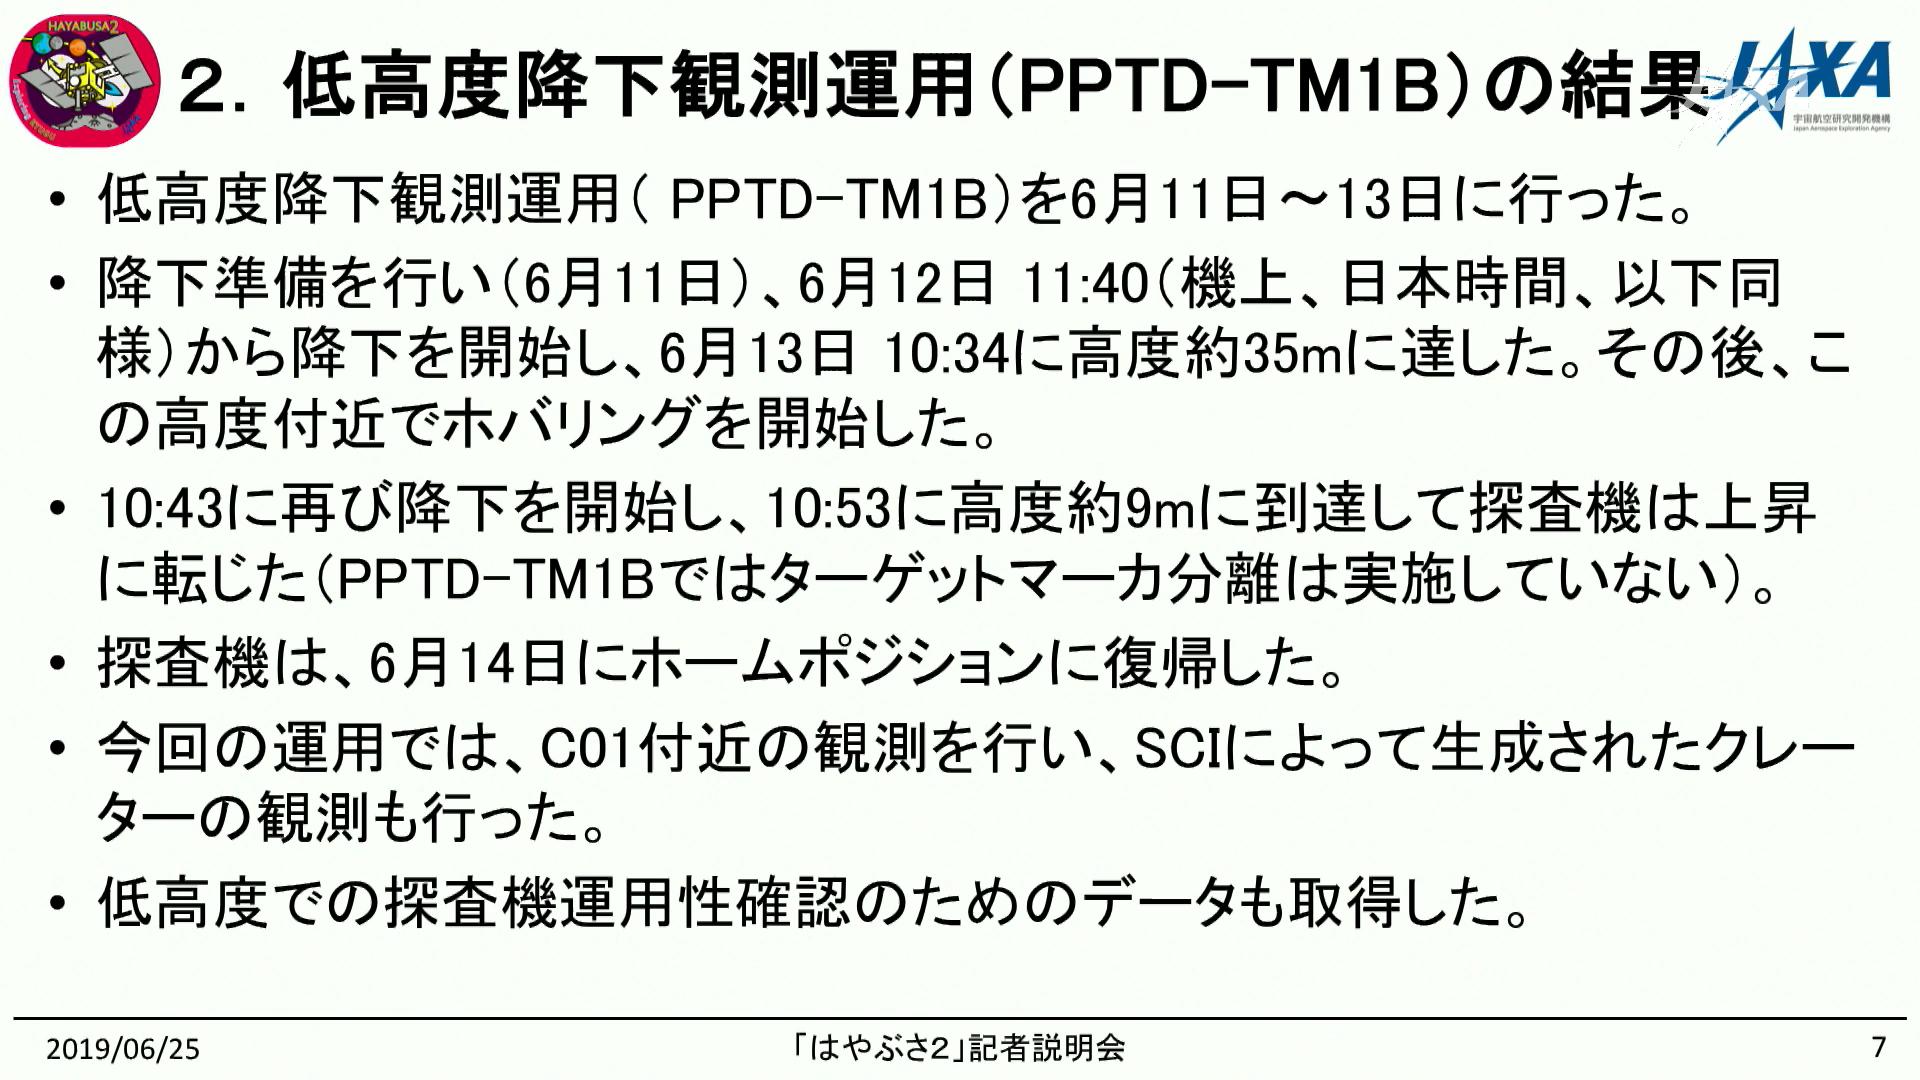 f:id:Imamura:20190625234700p:plain